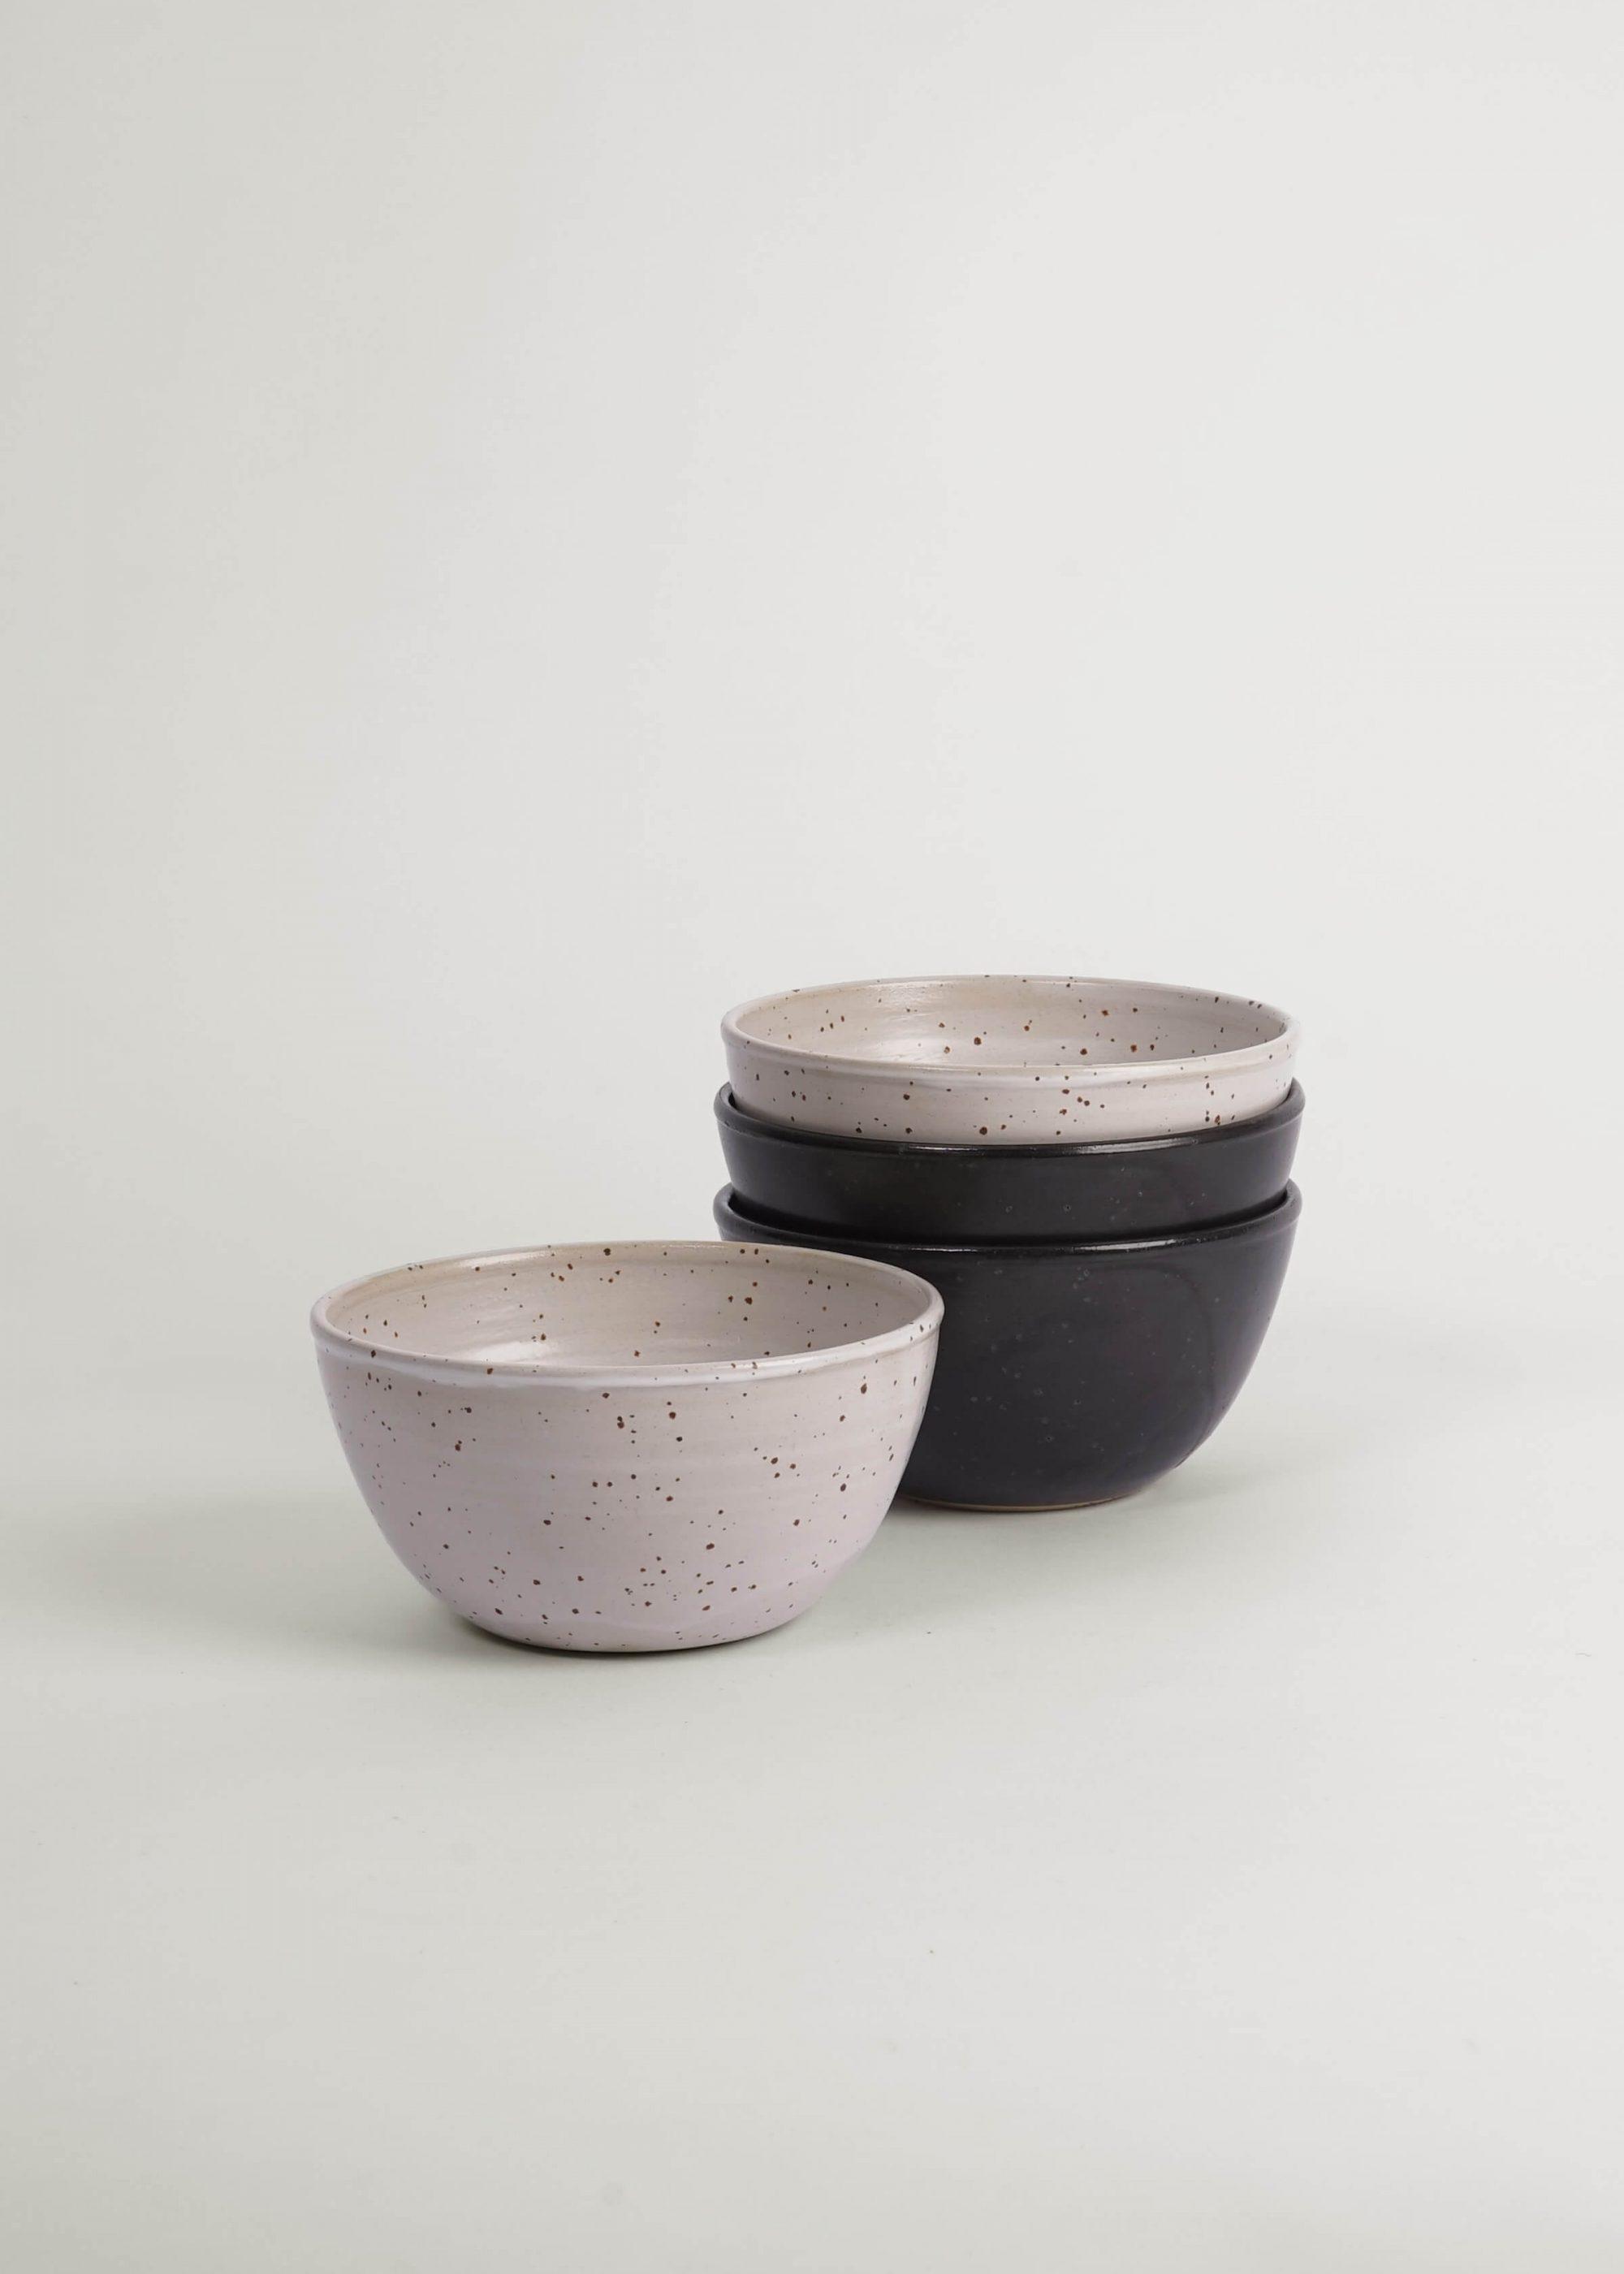 Product image for N° ICE8 Hemisphere Bowls Set